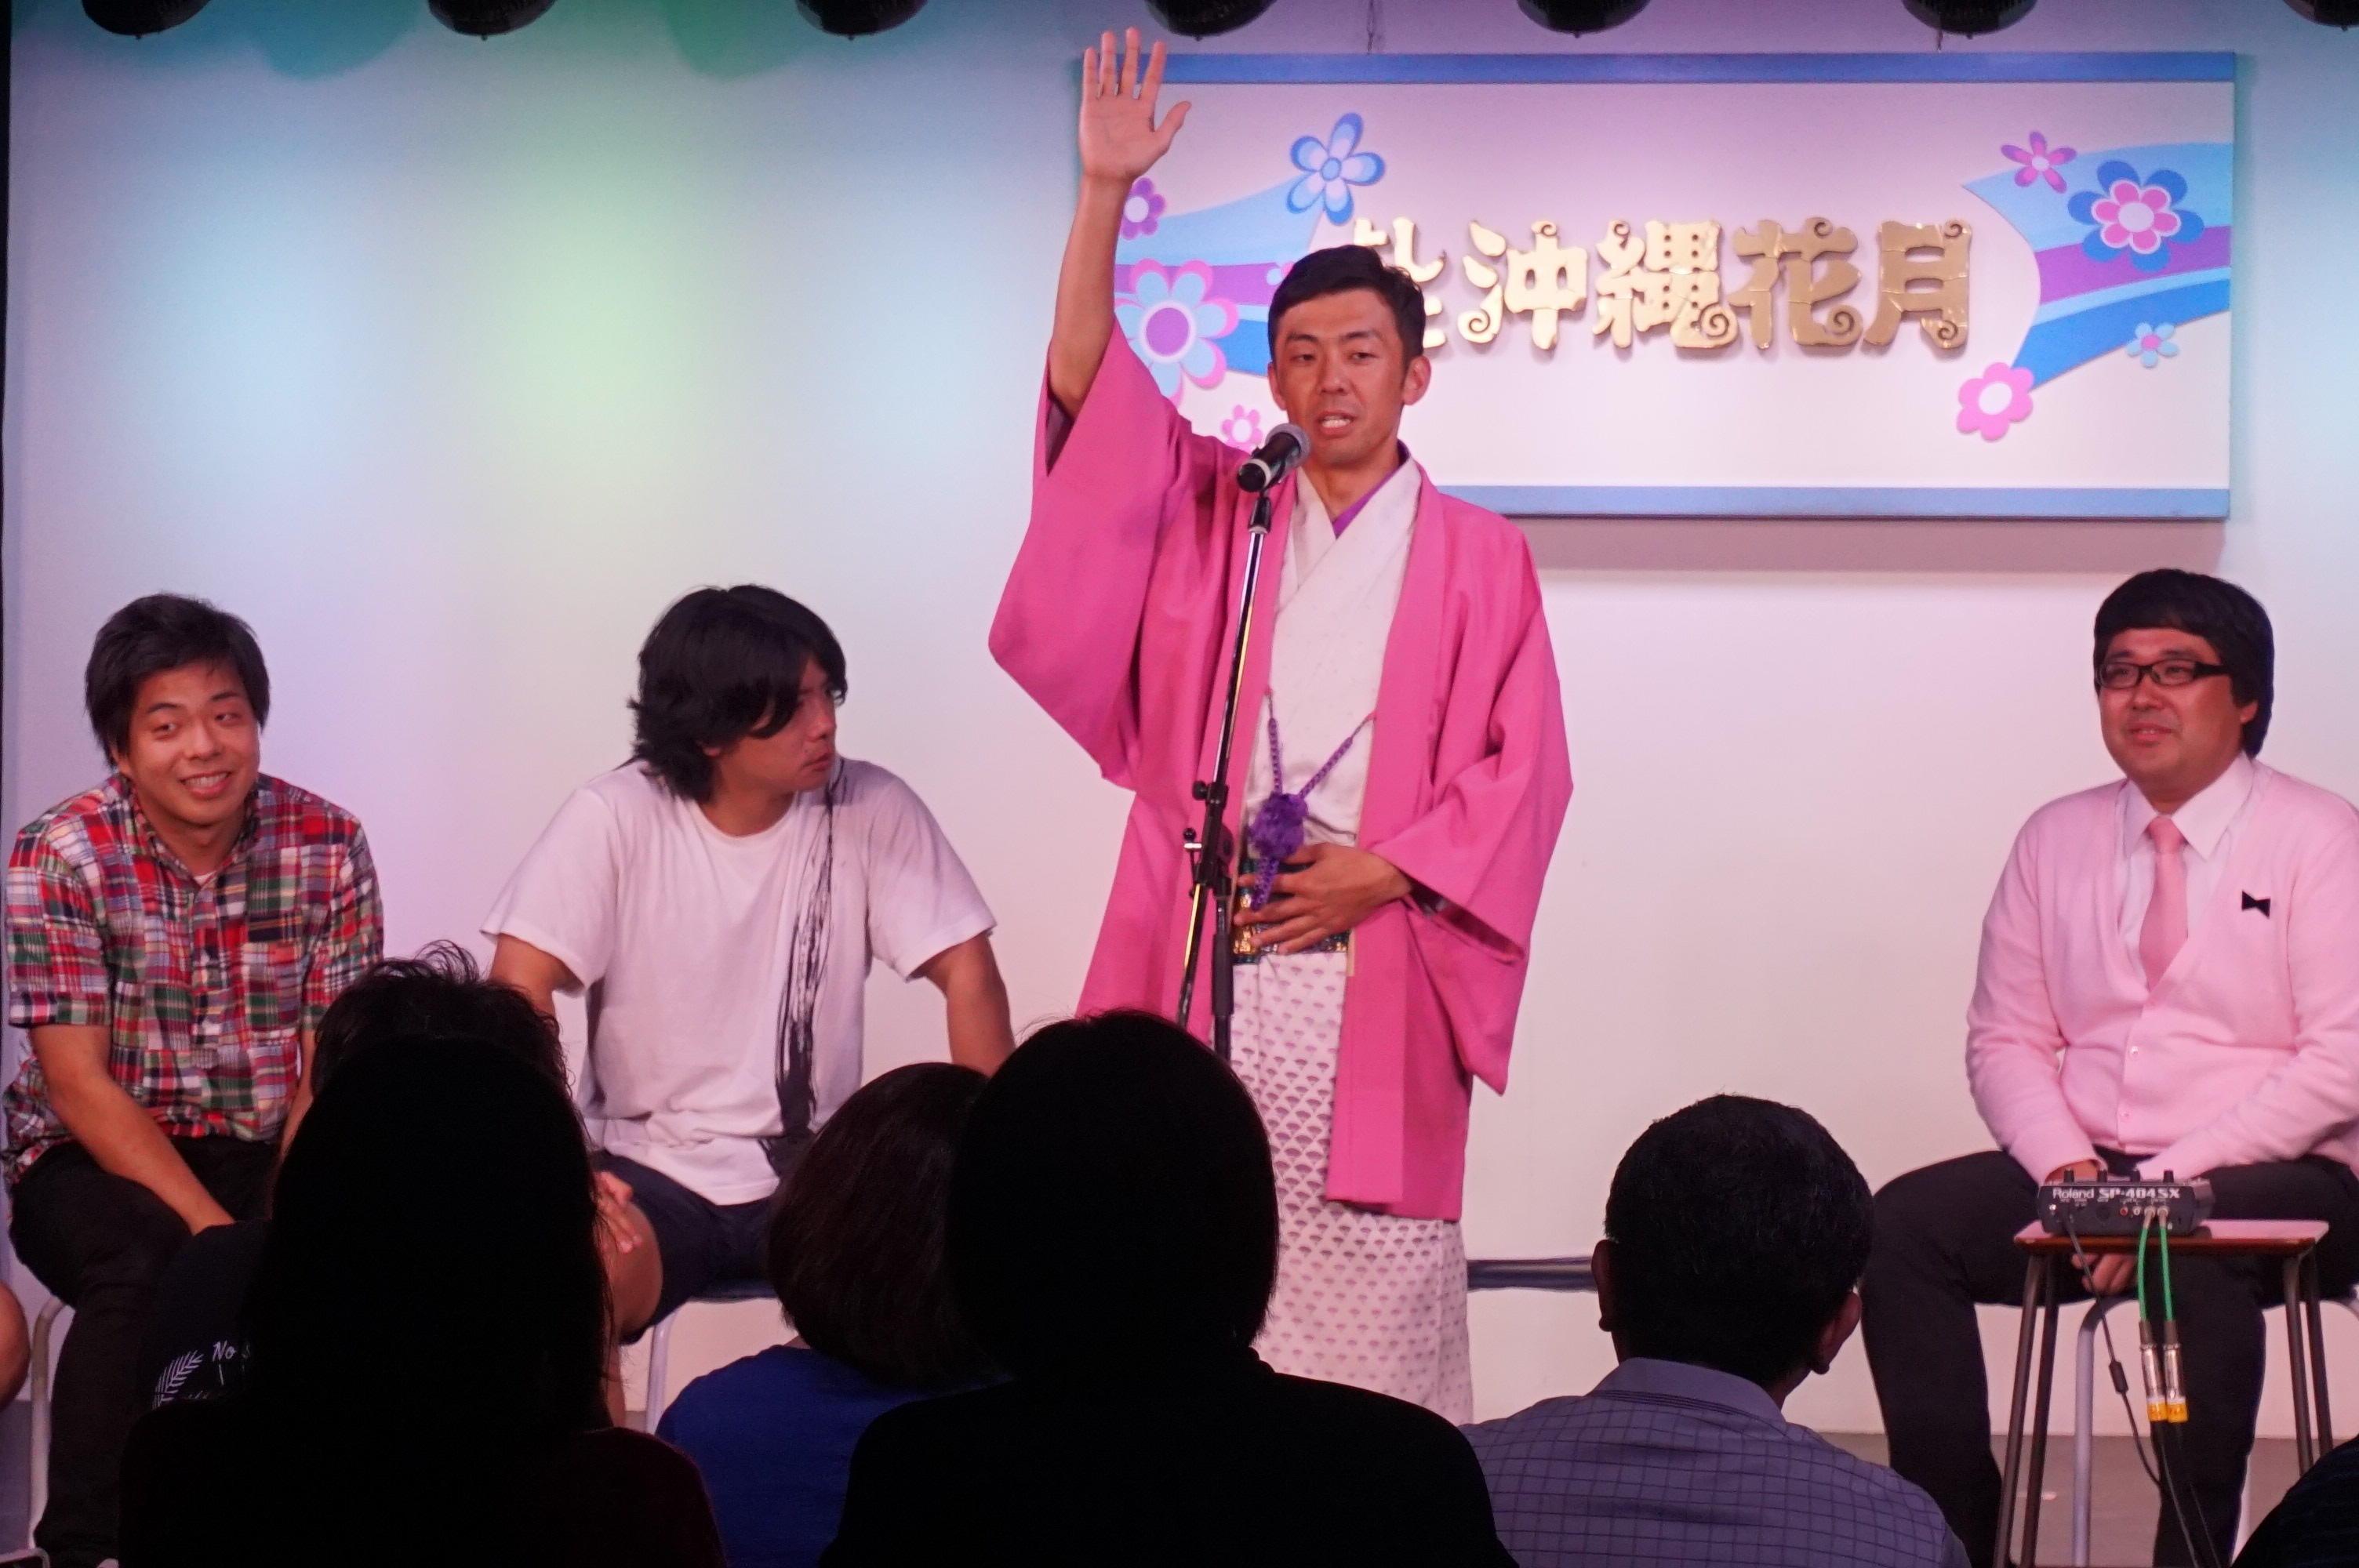 http://news.yoshimoto.co.jp/20180822203937-e3acaa6ee9b9c01ea0464e7a3e5f75f9b404a608.jpg